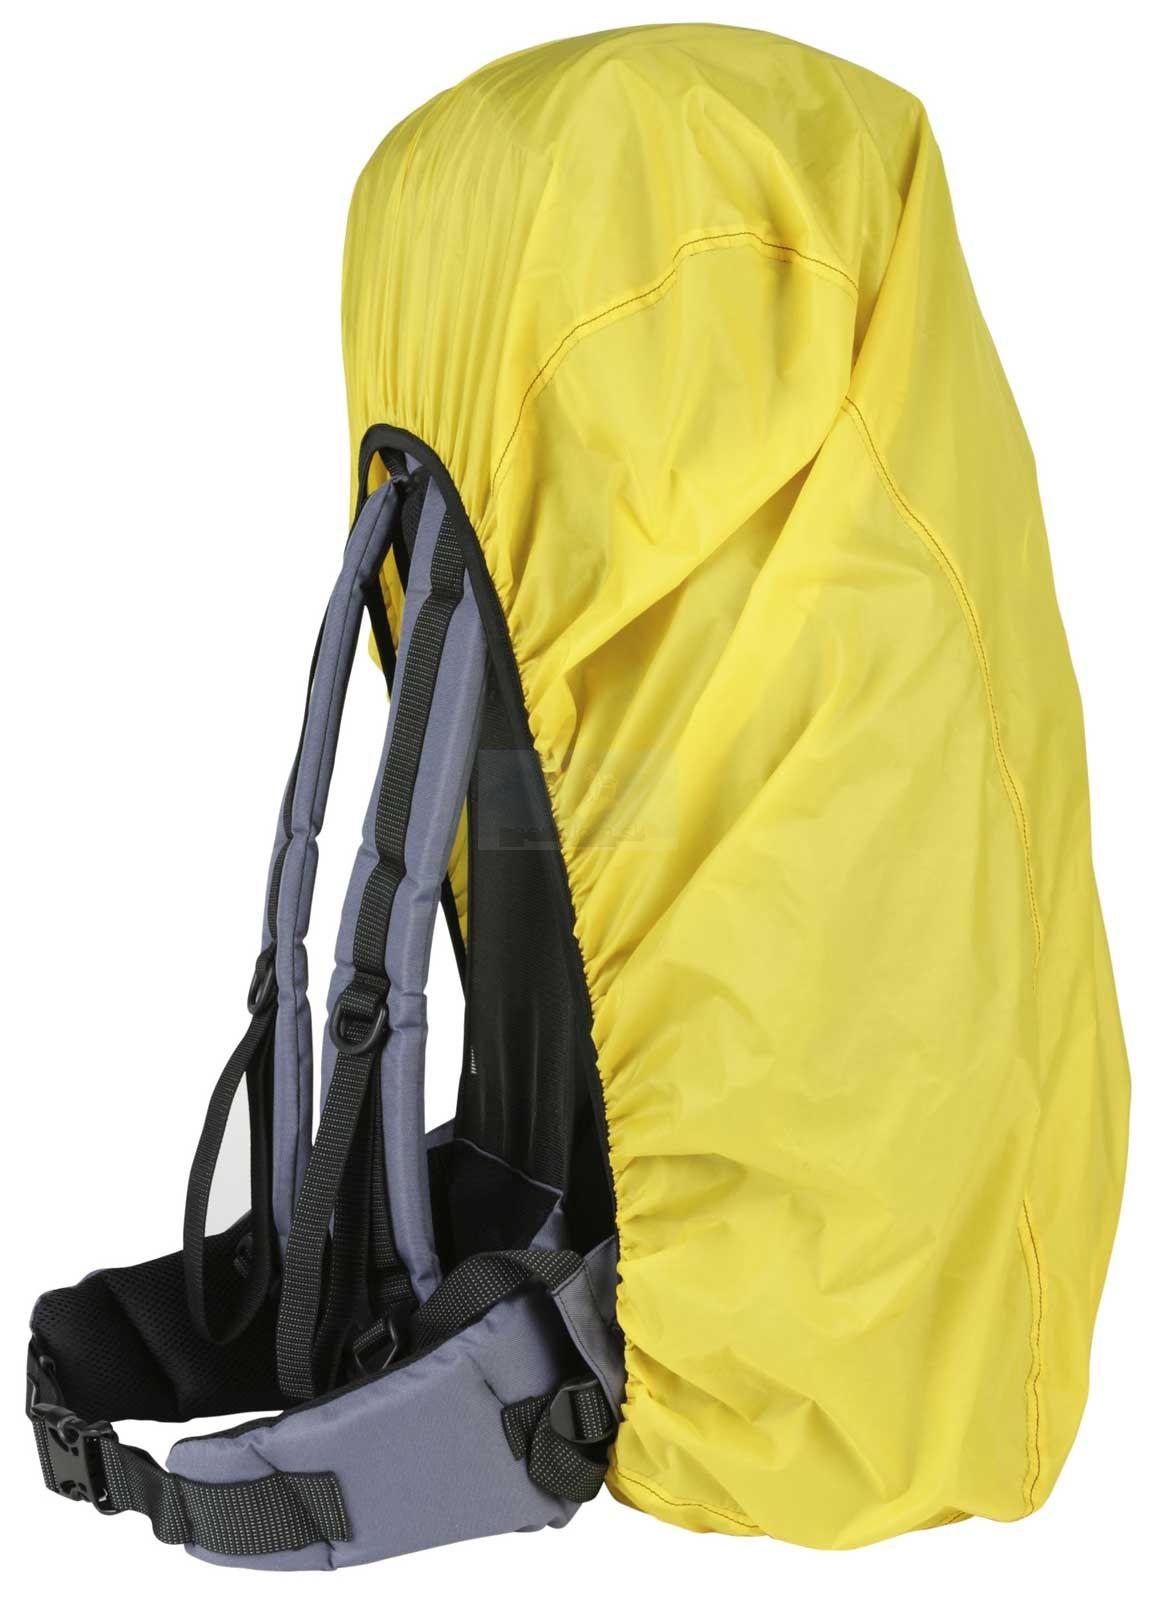 ferrino-cover-reg-чехол-на-рюкзак